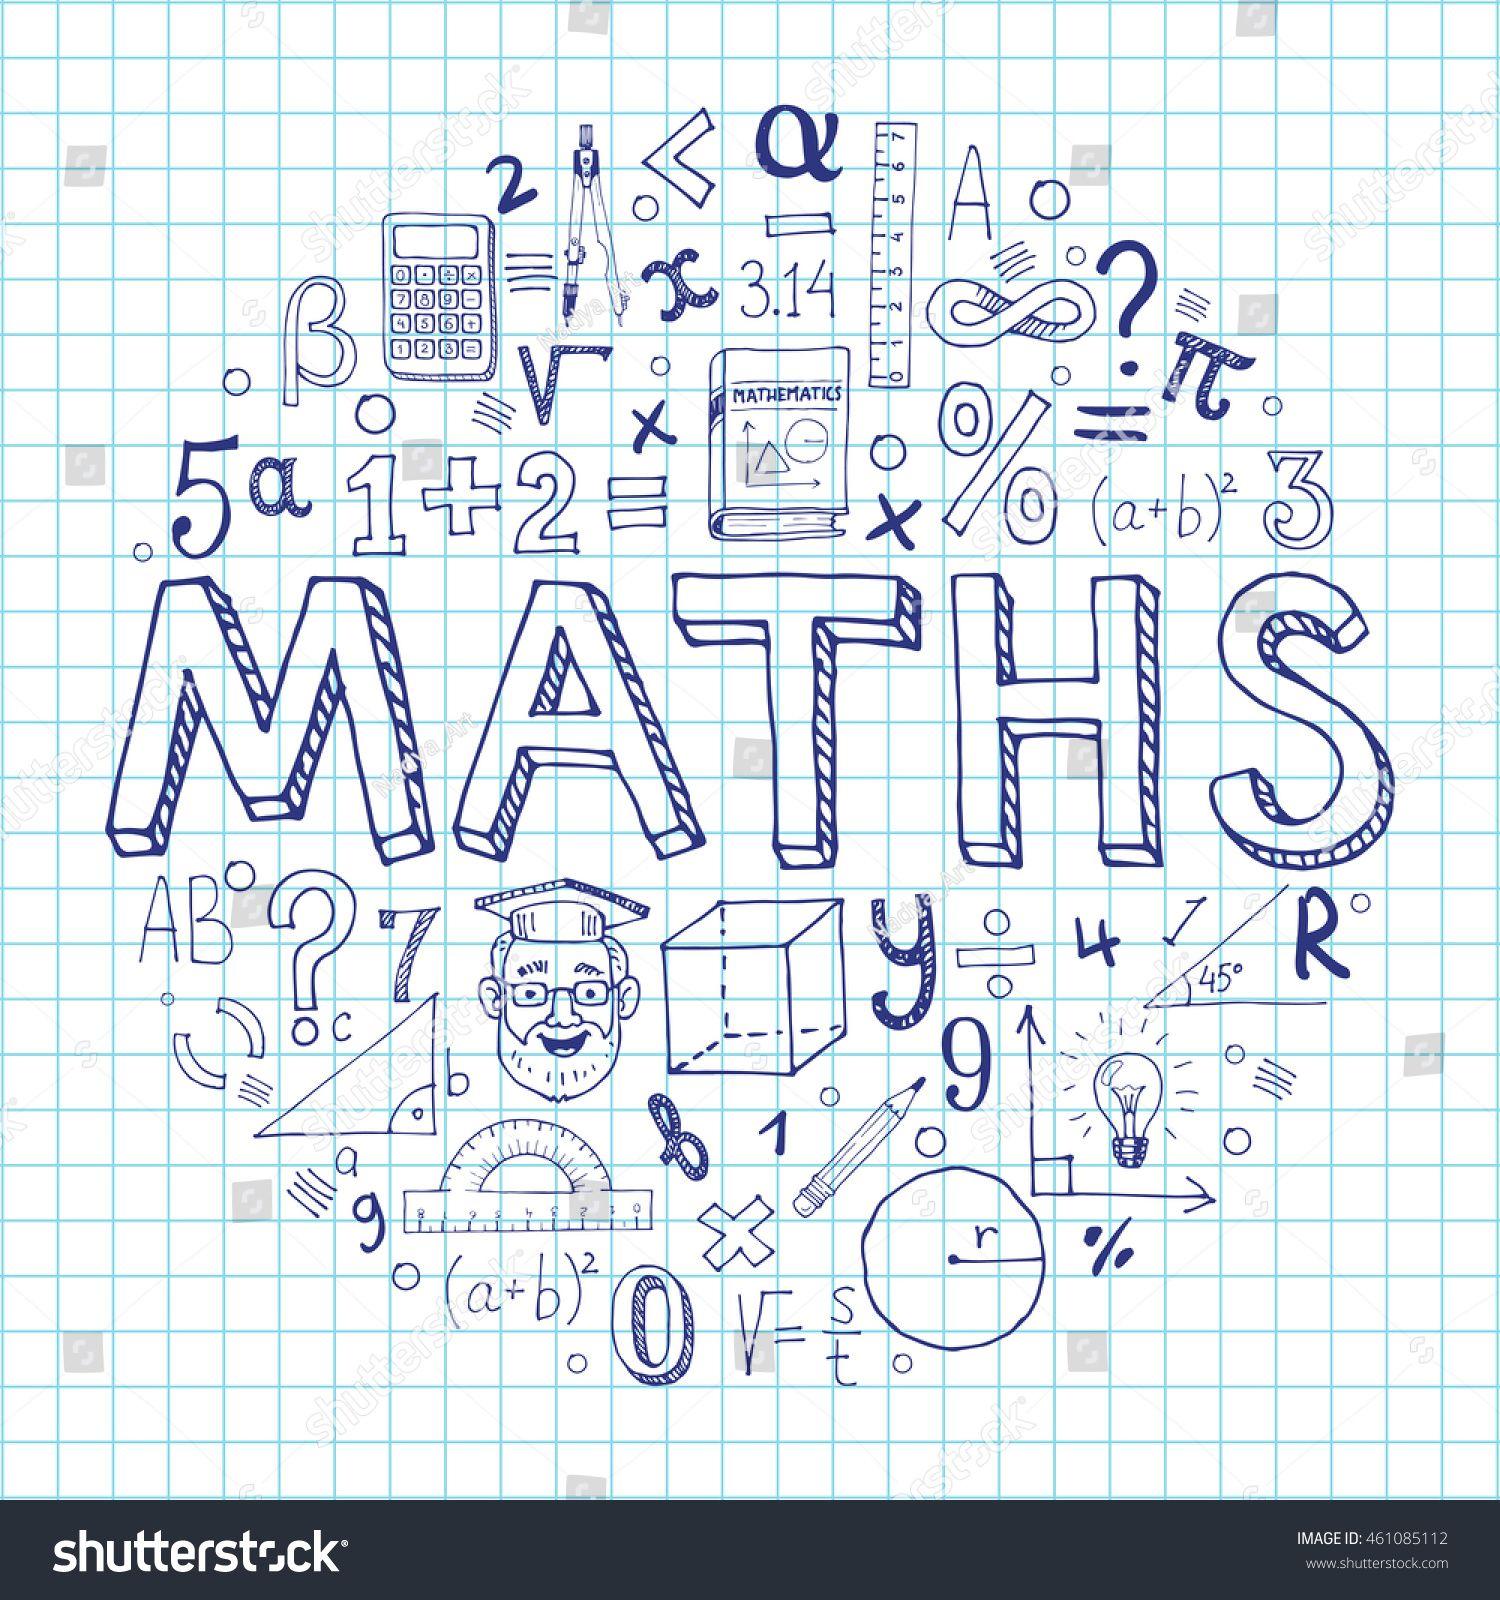 Image result for Maths background